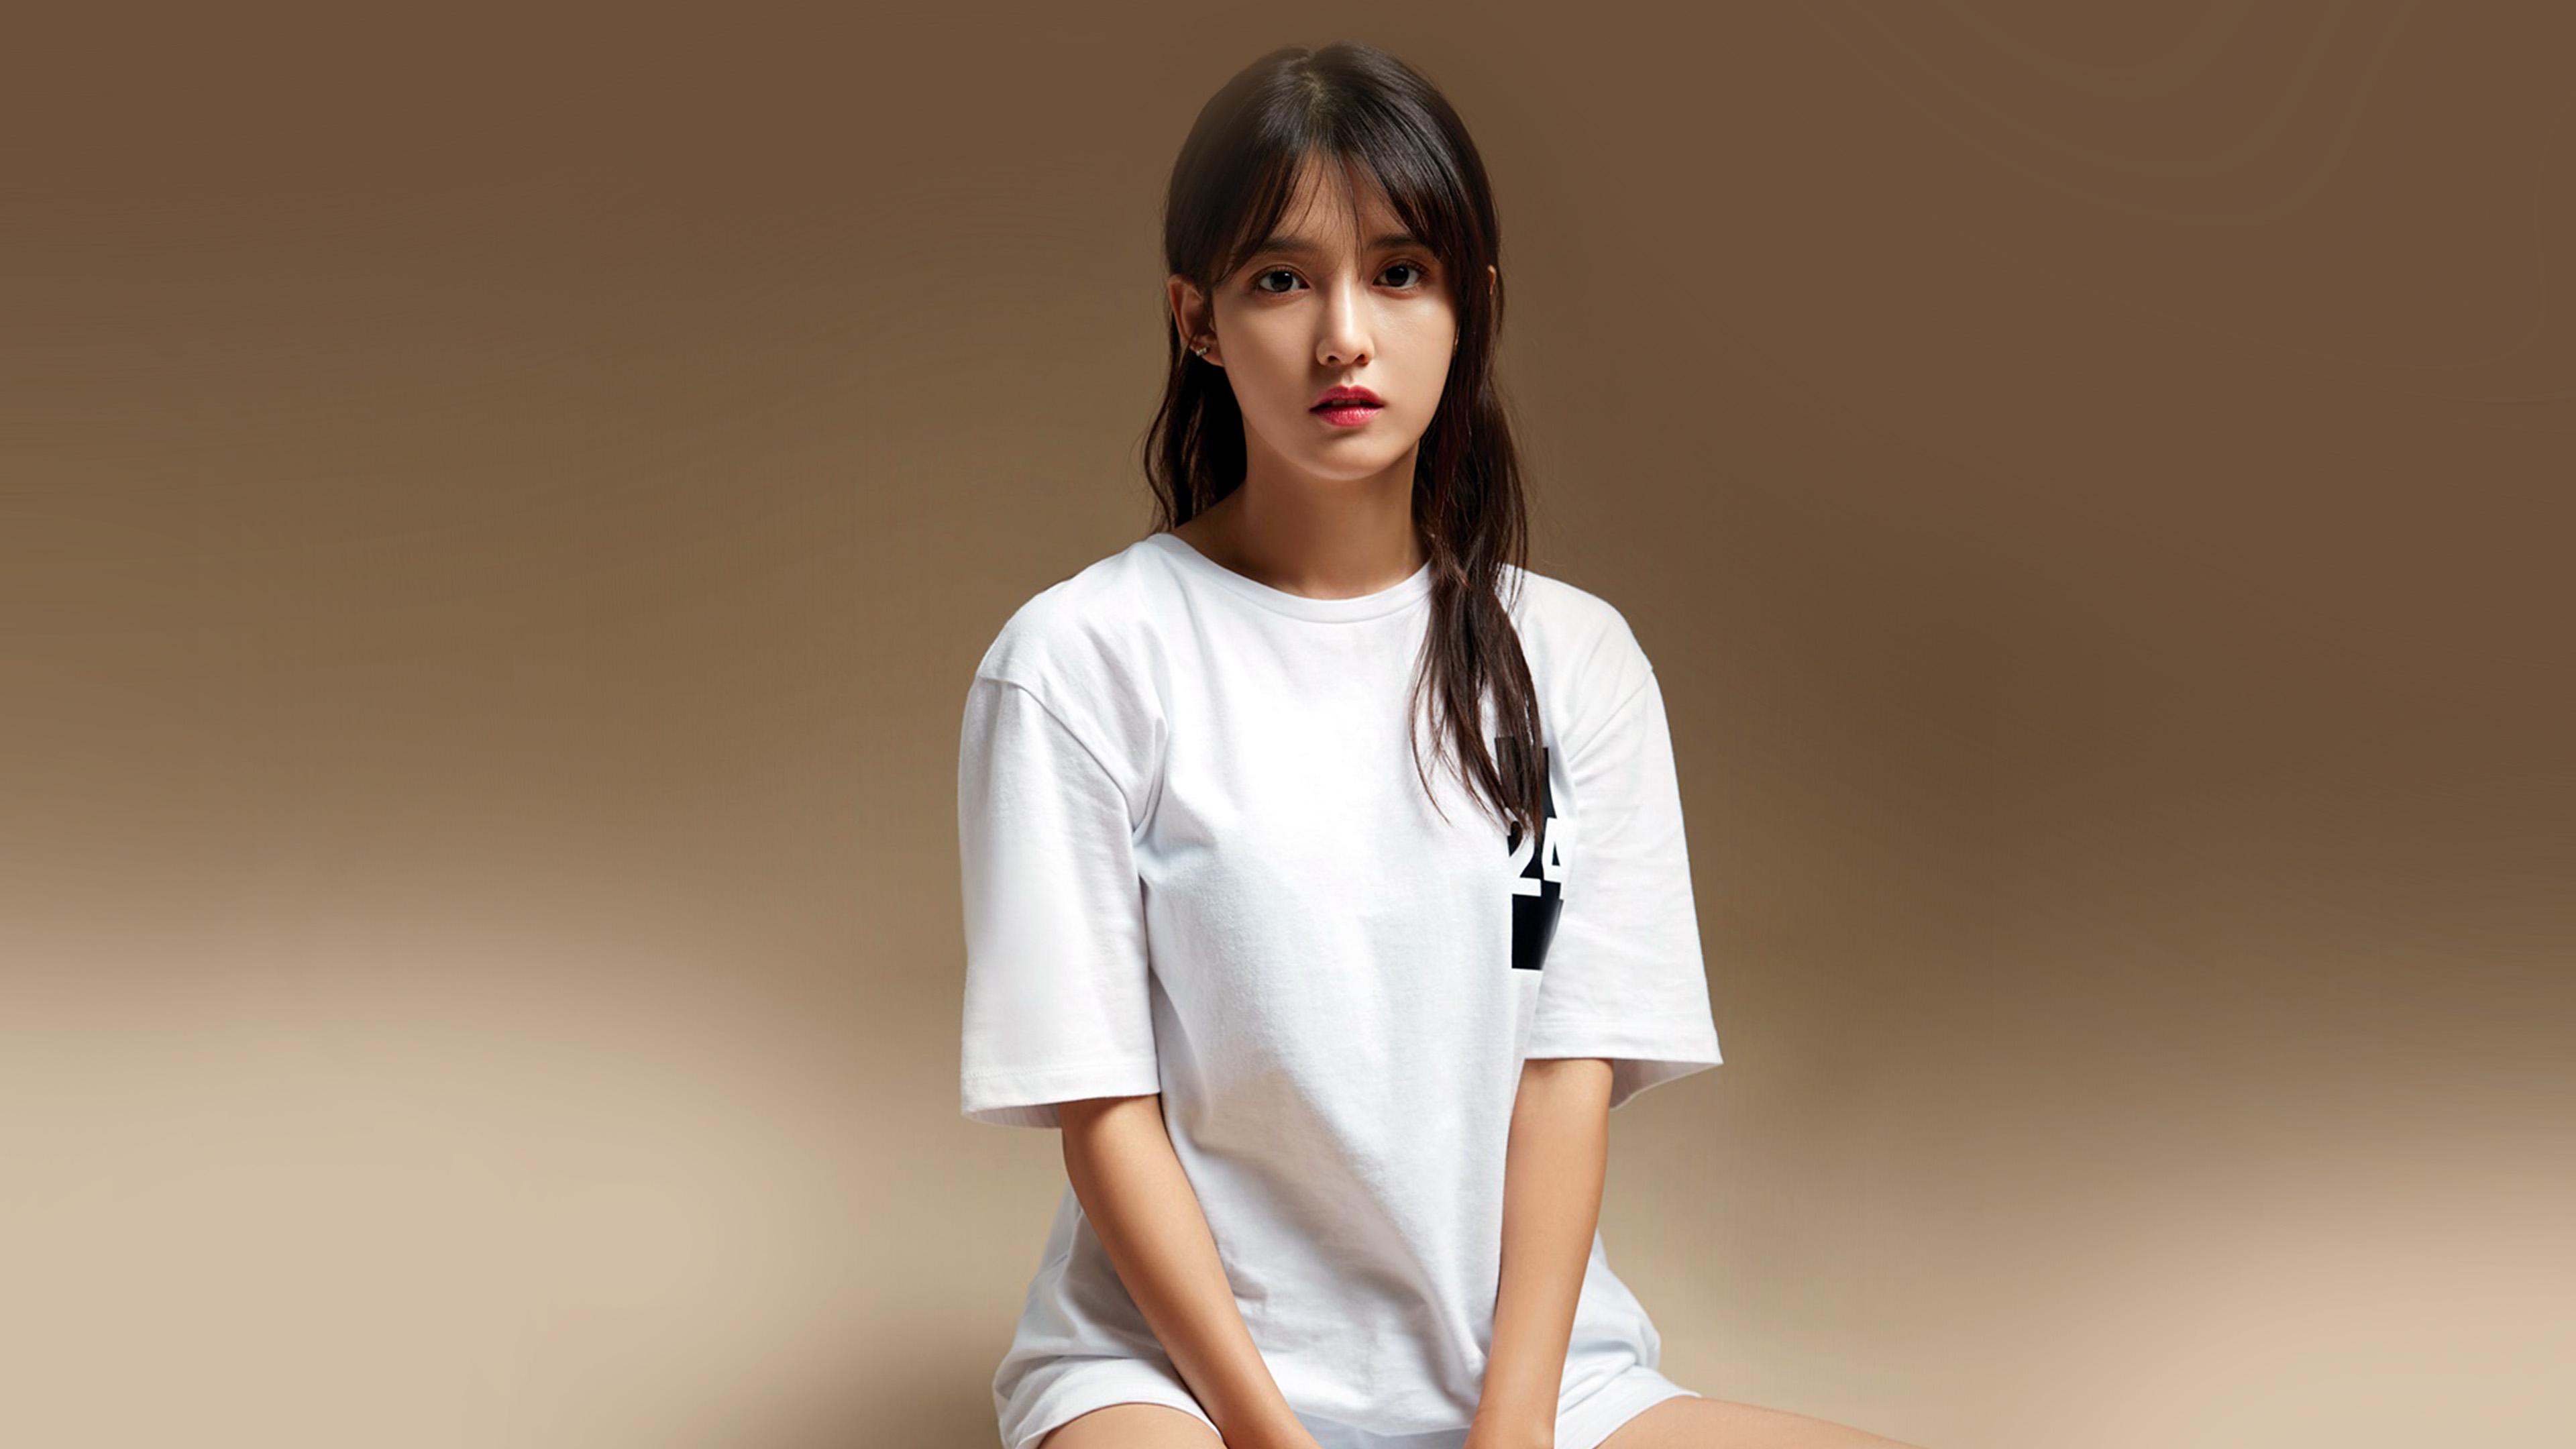 Papers Co Desktop Wallpaper Hk16 Nam Bora Kpop Girl